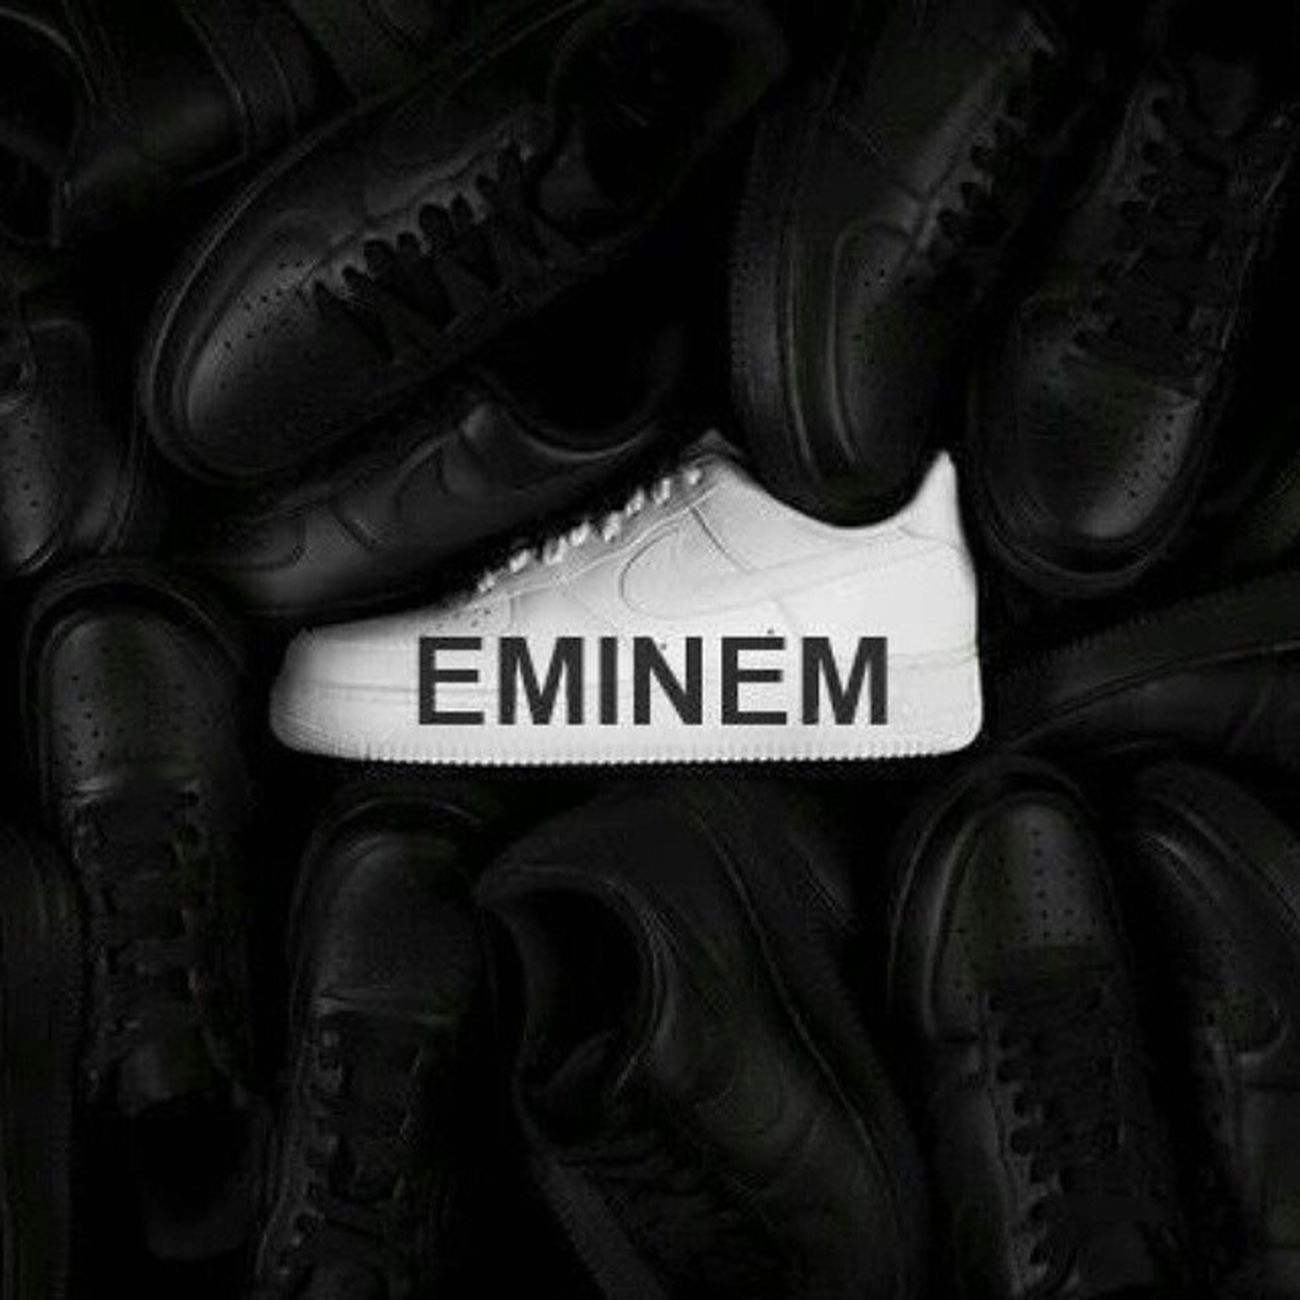 Kısa ve öz. Eminem Marshall Bruce Mathers Rapking Rapgod